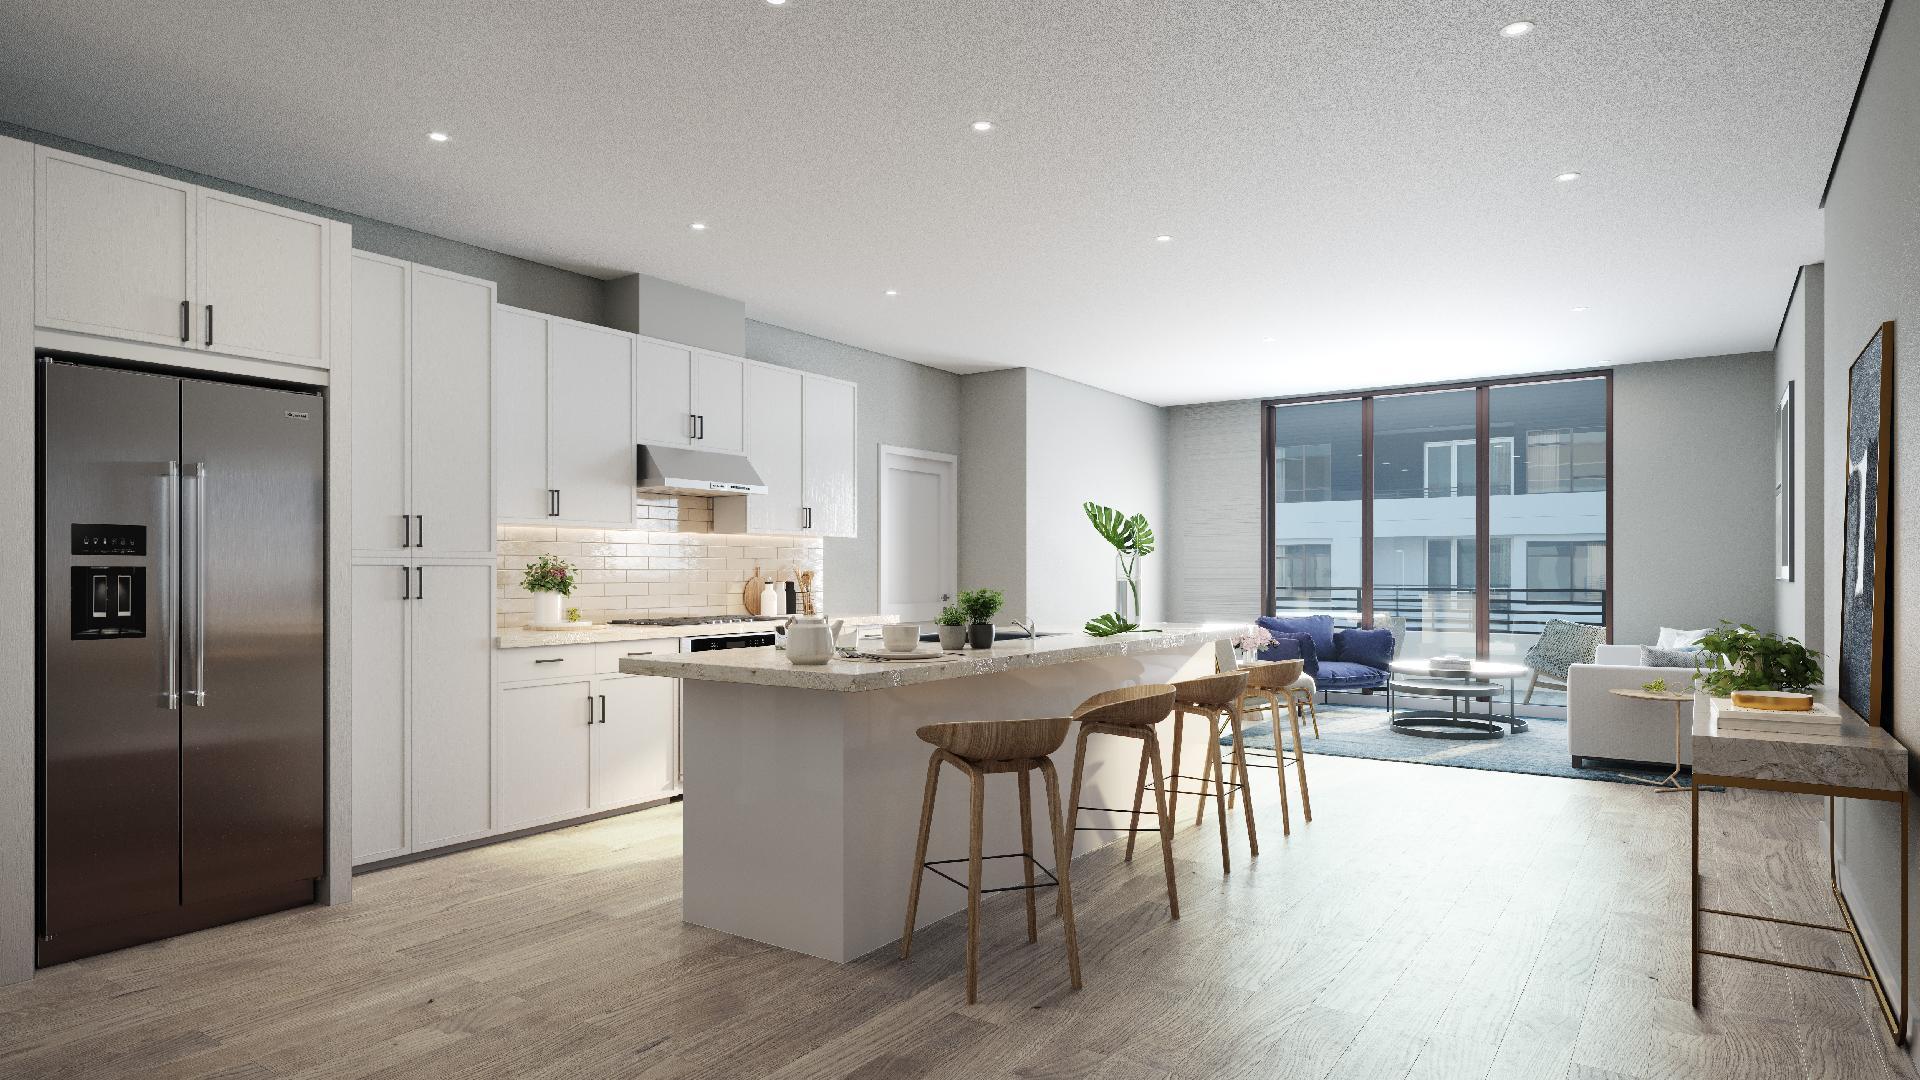 Emerald home design spacious open kitchen layout